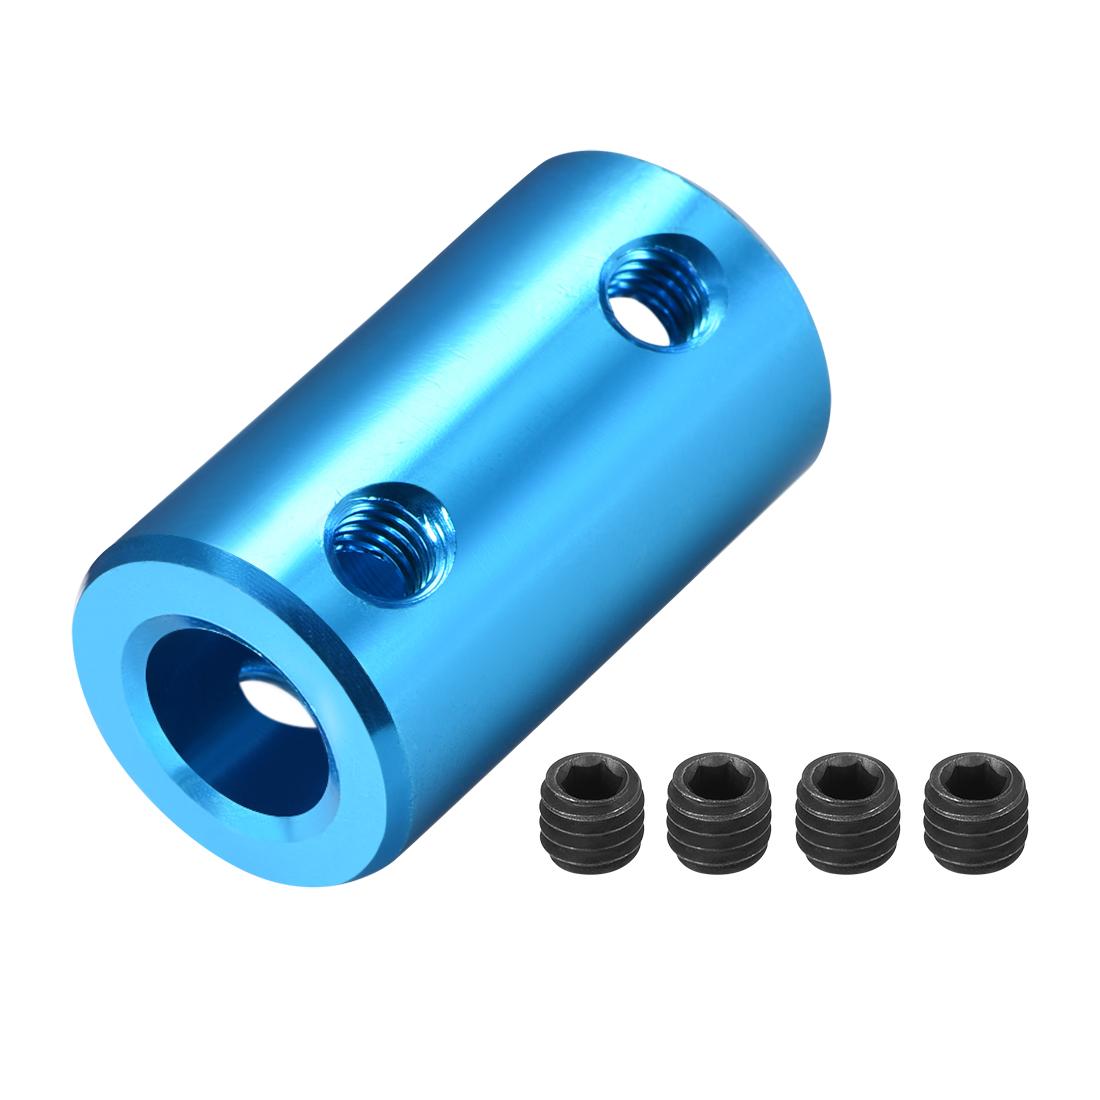 Shaft Coupling 8mm to 8mm L25xD14 Rigid Stepper Motor Wheel Coupler Connect Blue